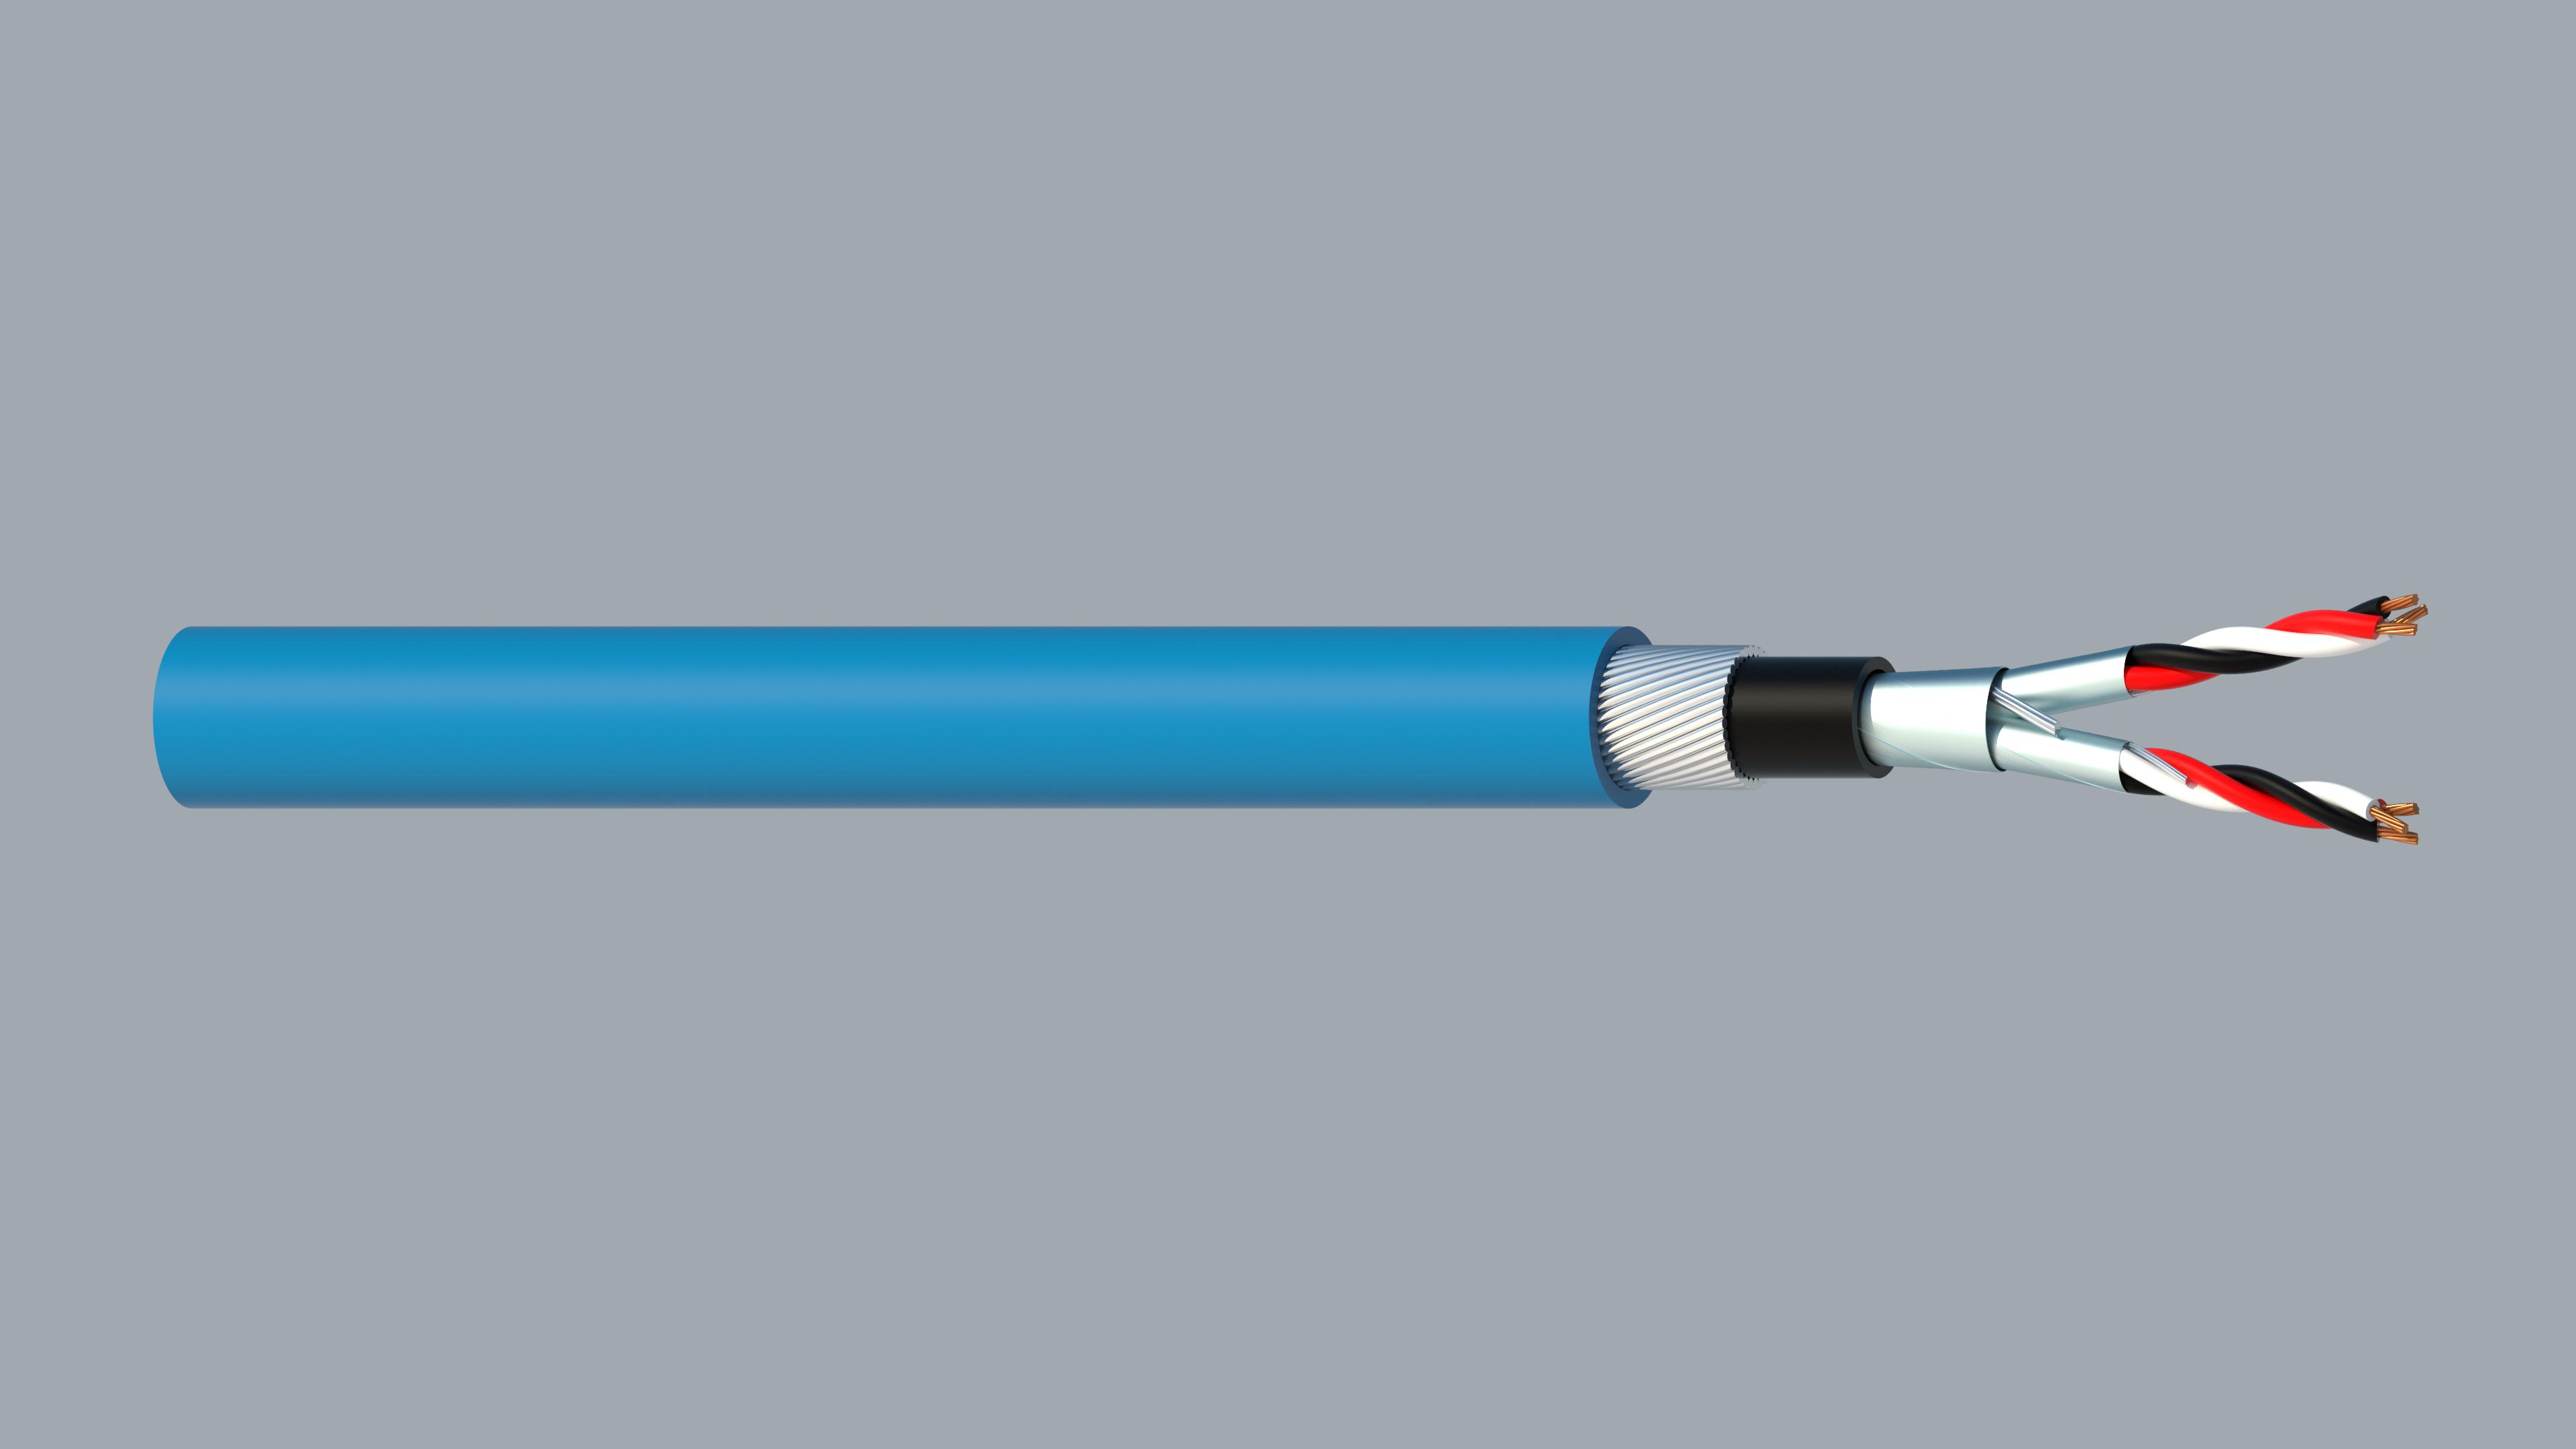 2 Triad 0.5mm2 Cu/PVC/ISOS/PVC/SWA/PVC Maser Instrumentation Cable - Blue Sheath